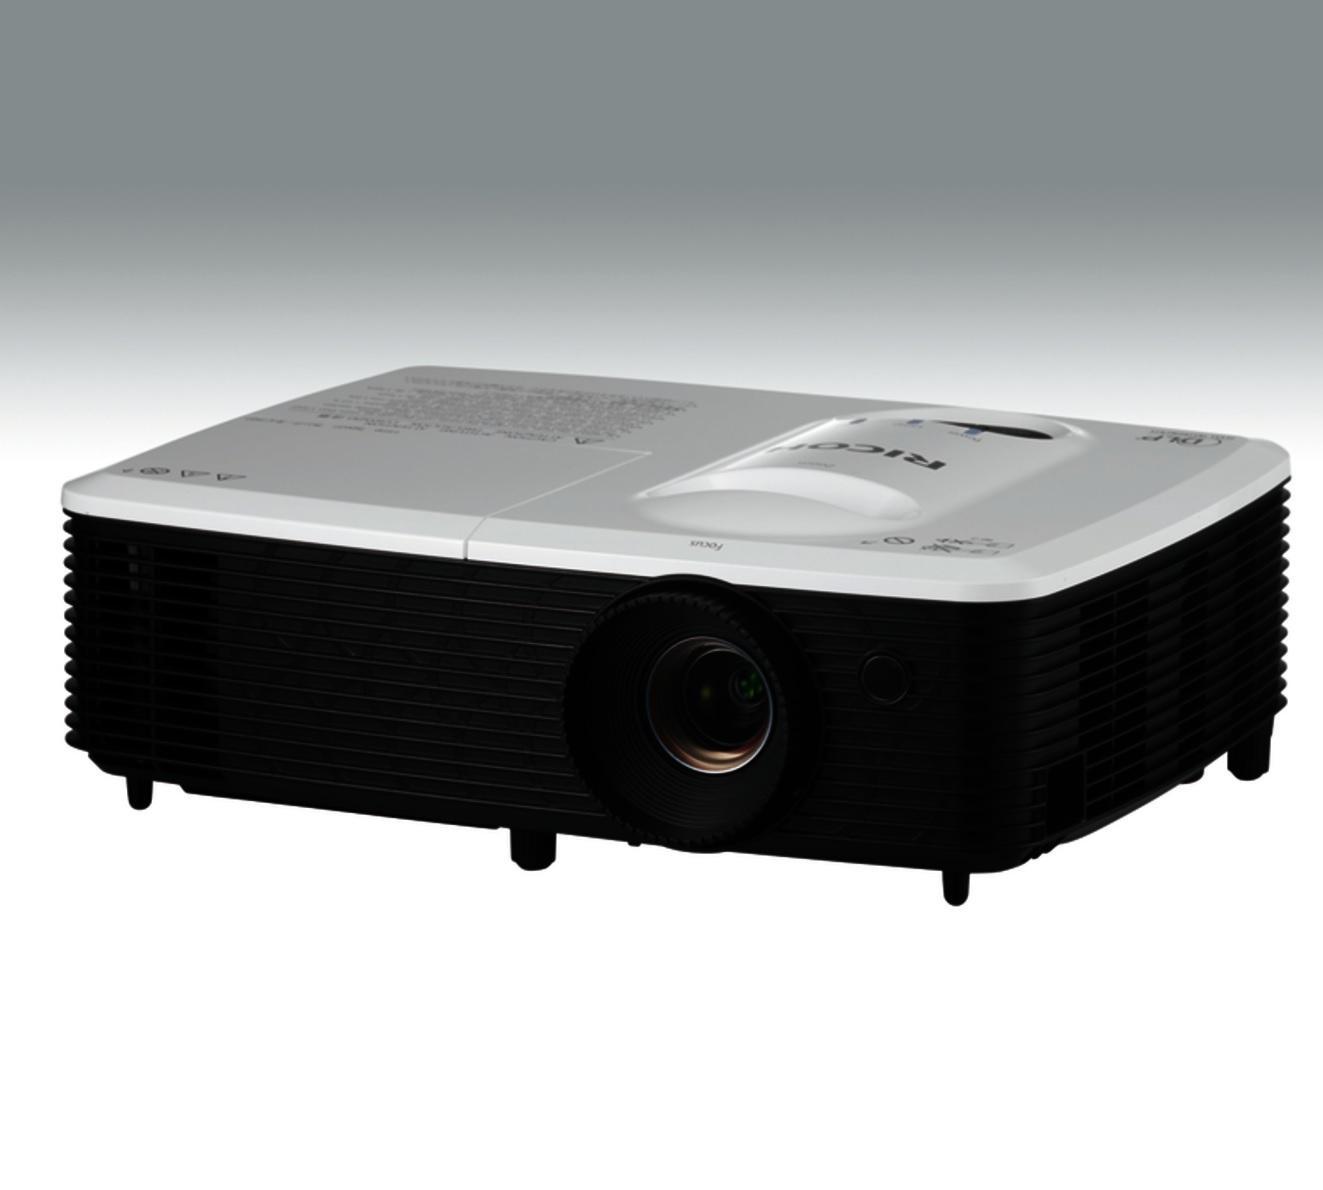 Видеопроектор RICOH X2440,DLP, 1024 x 768(XGA), 3000 ANSI, 10 000:1, HDMI, MHL